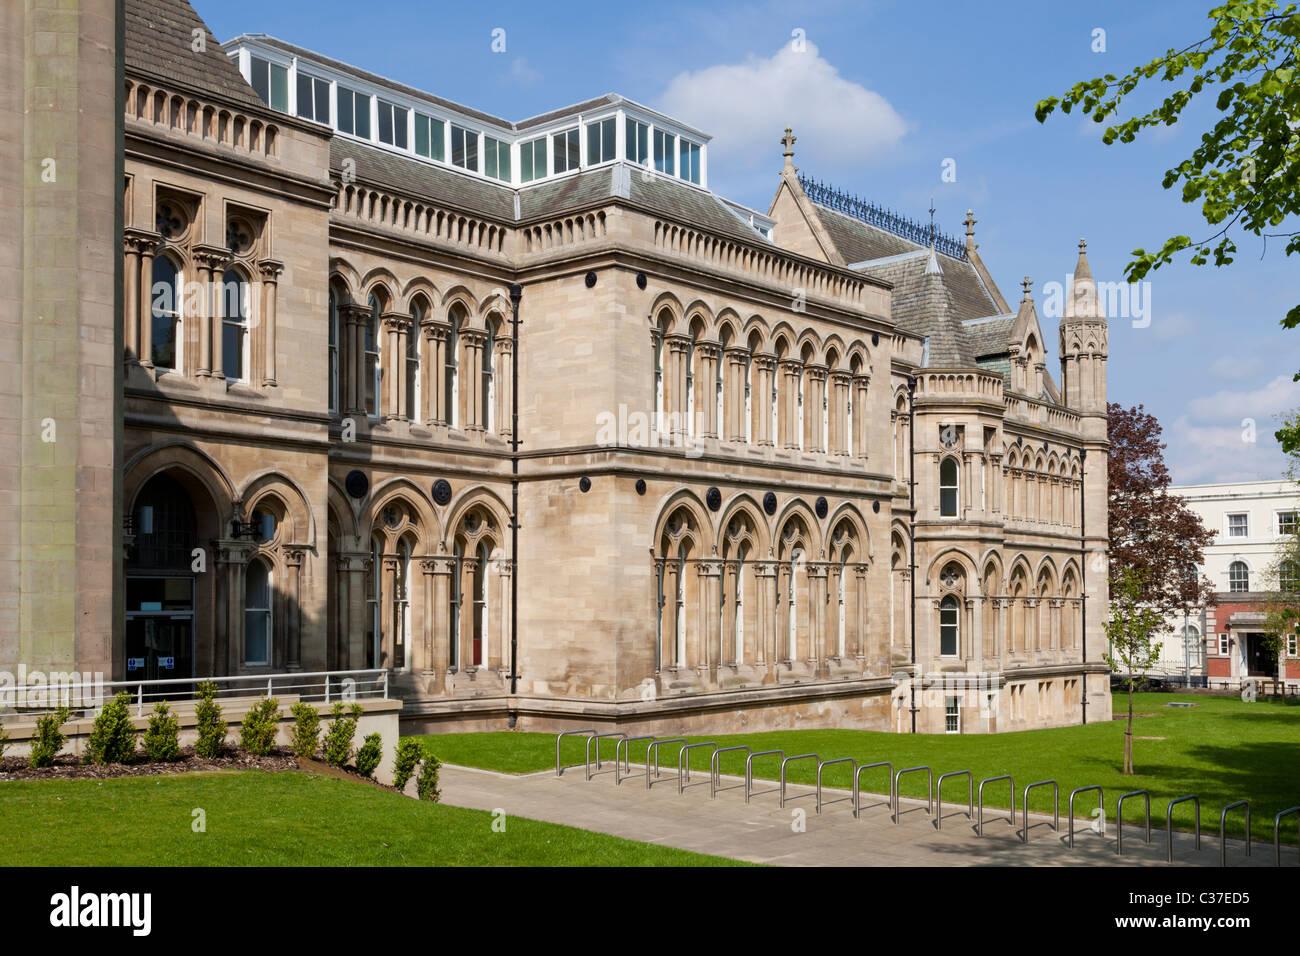 Newton y Arkwright edificios Nottingham Trent University, Nottingham, Reino Unido Imagen De Stock